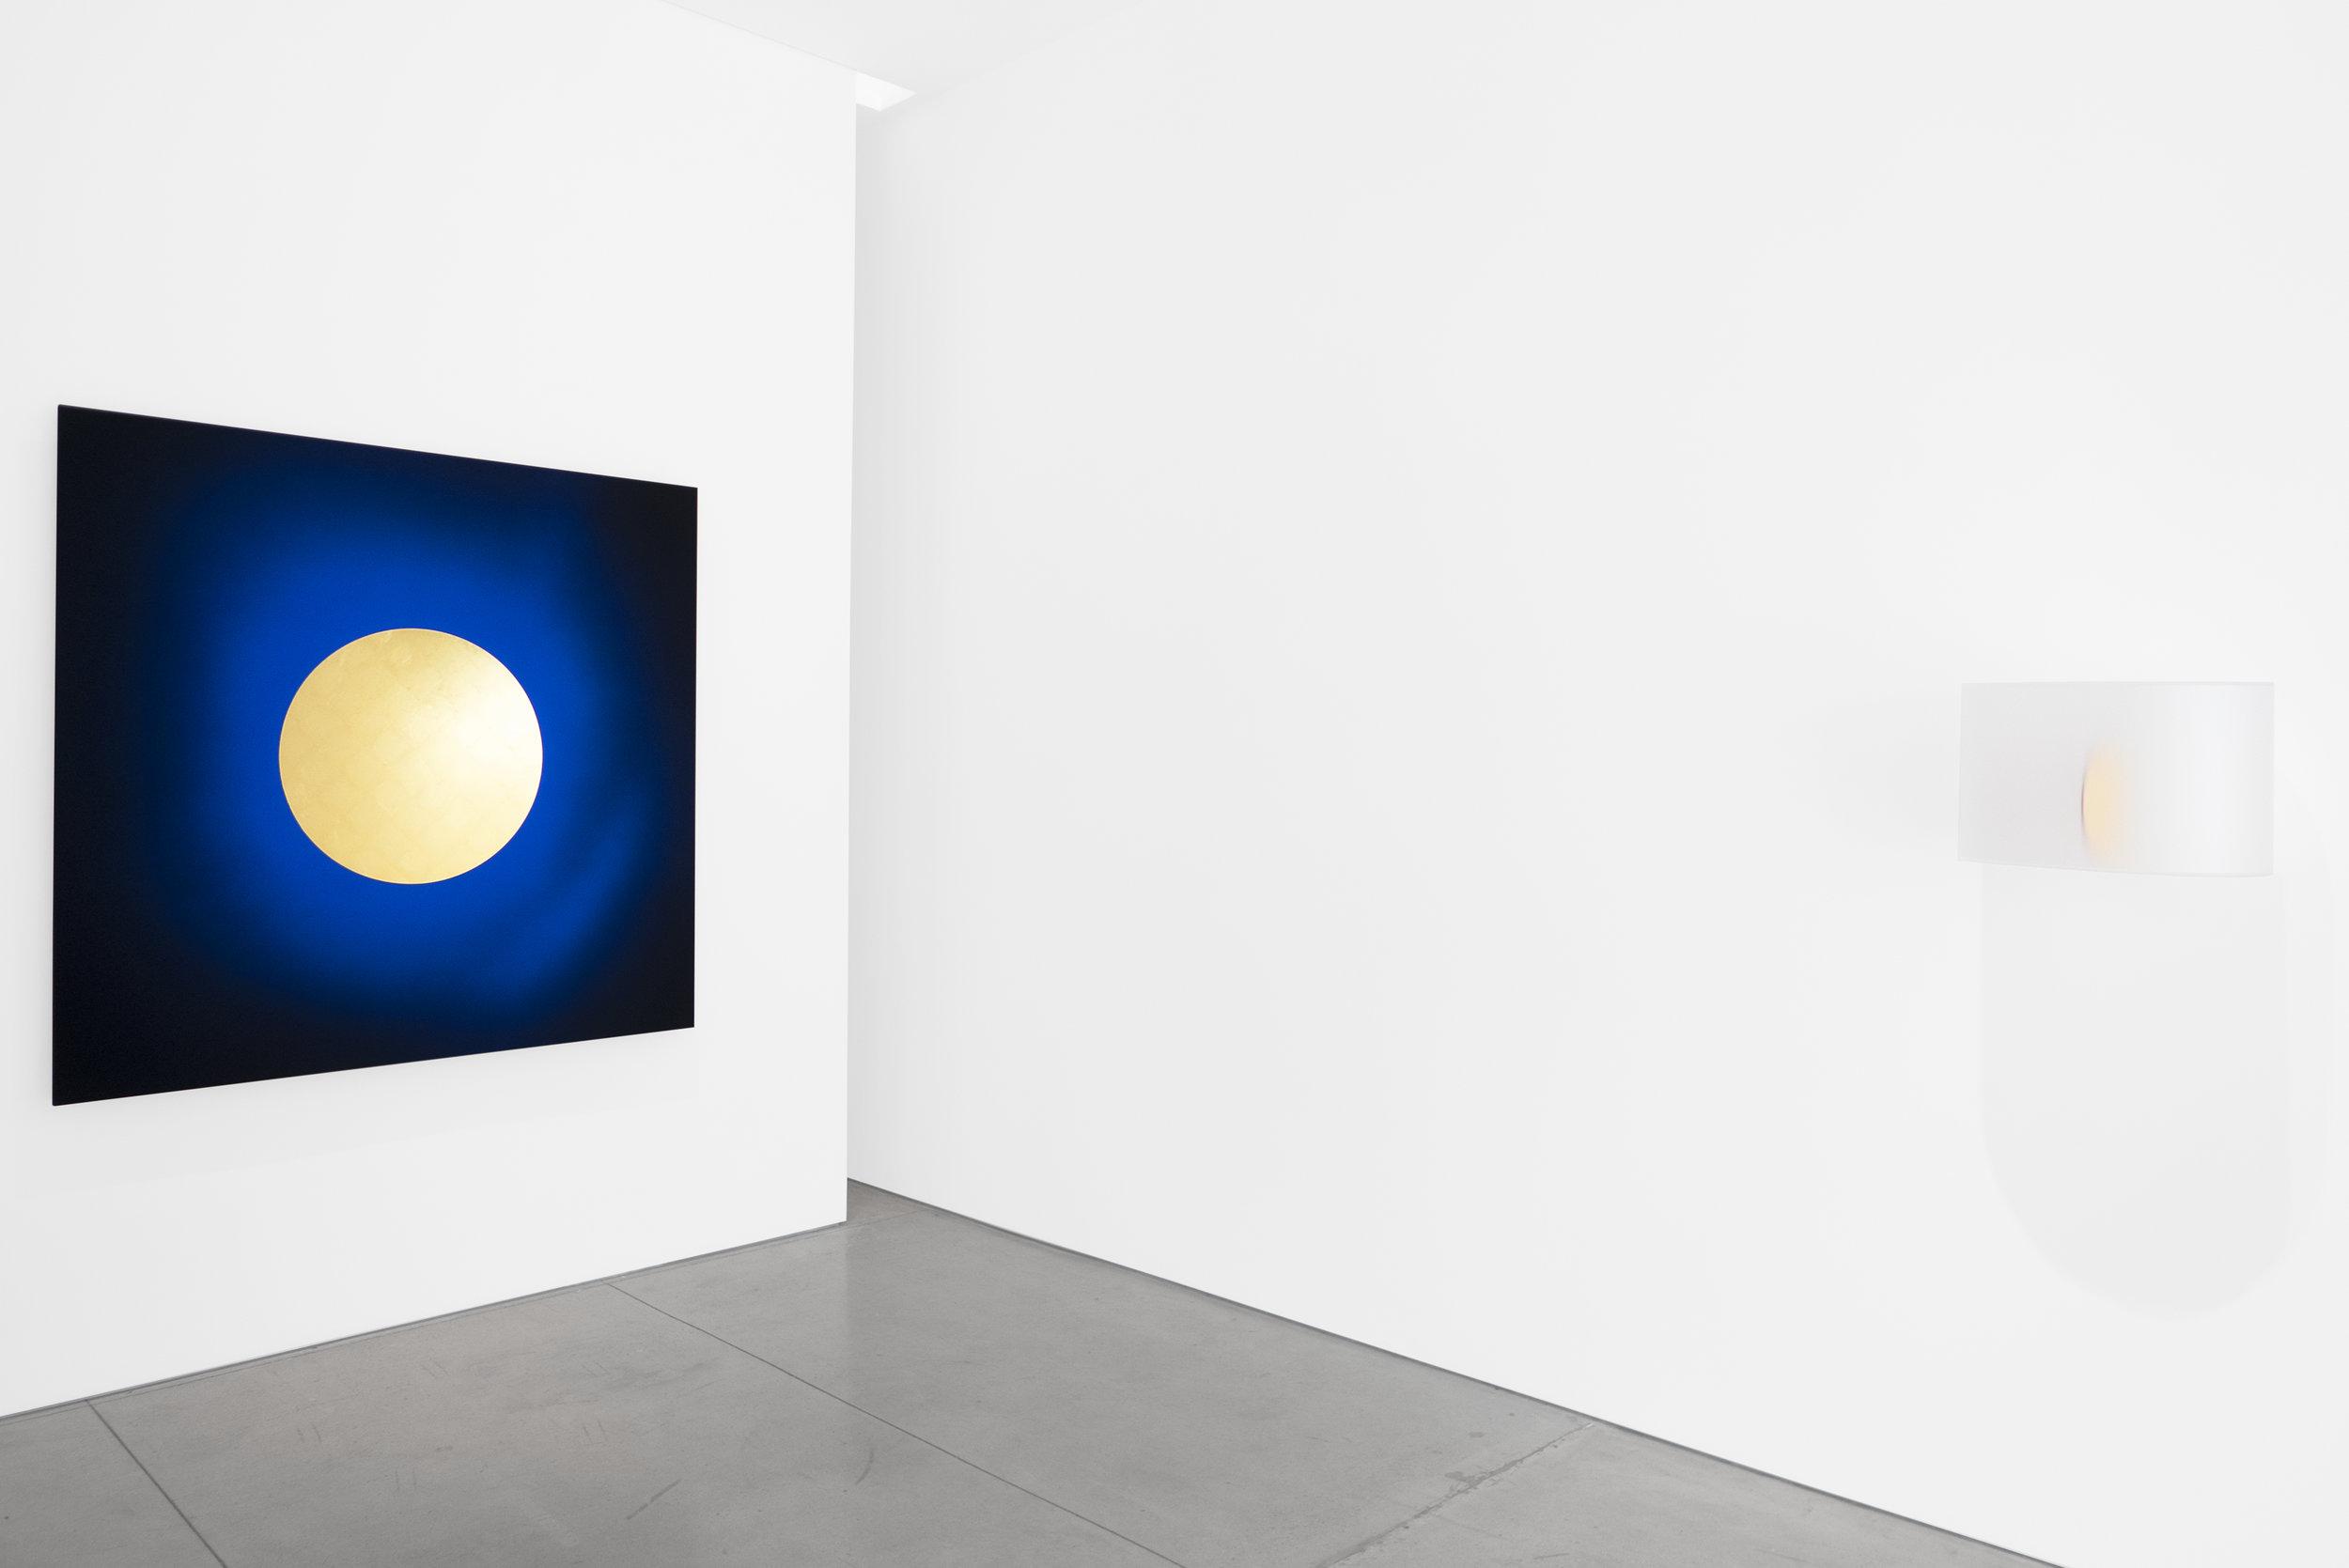 25 Years_Peter Blake Gallery_2019_Installation View_12.jpg